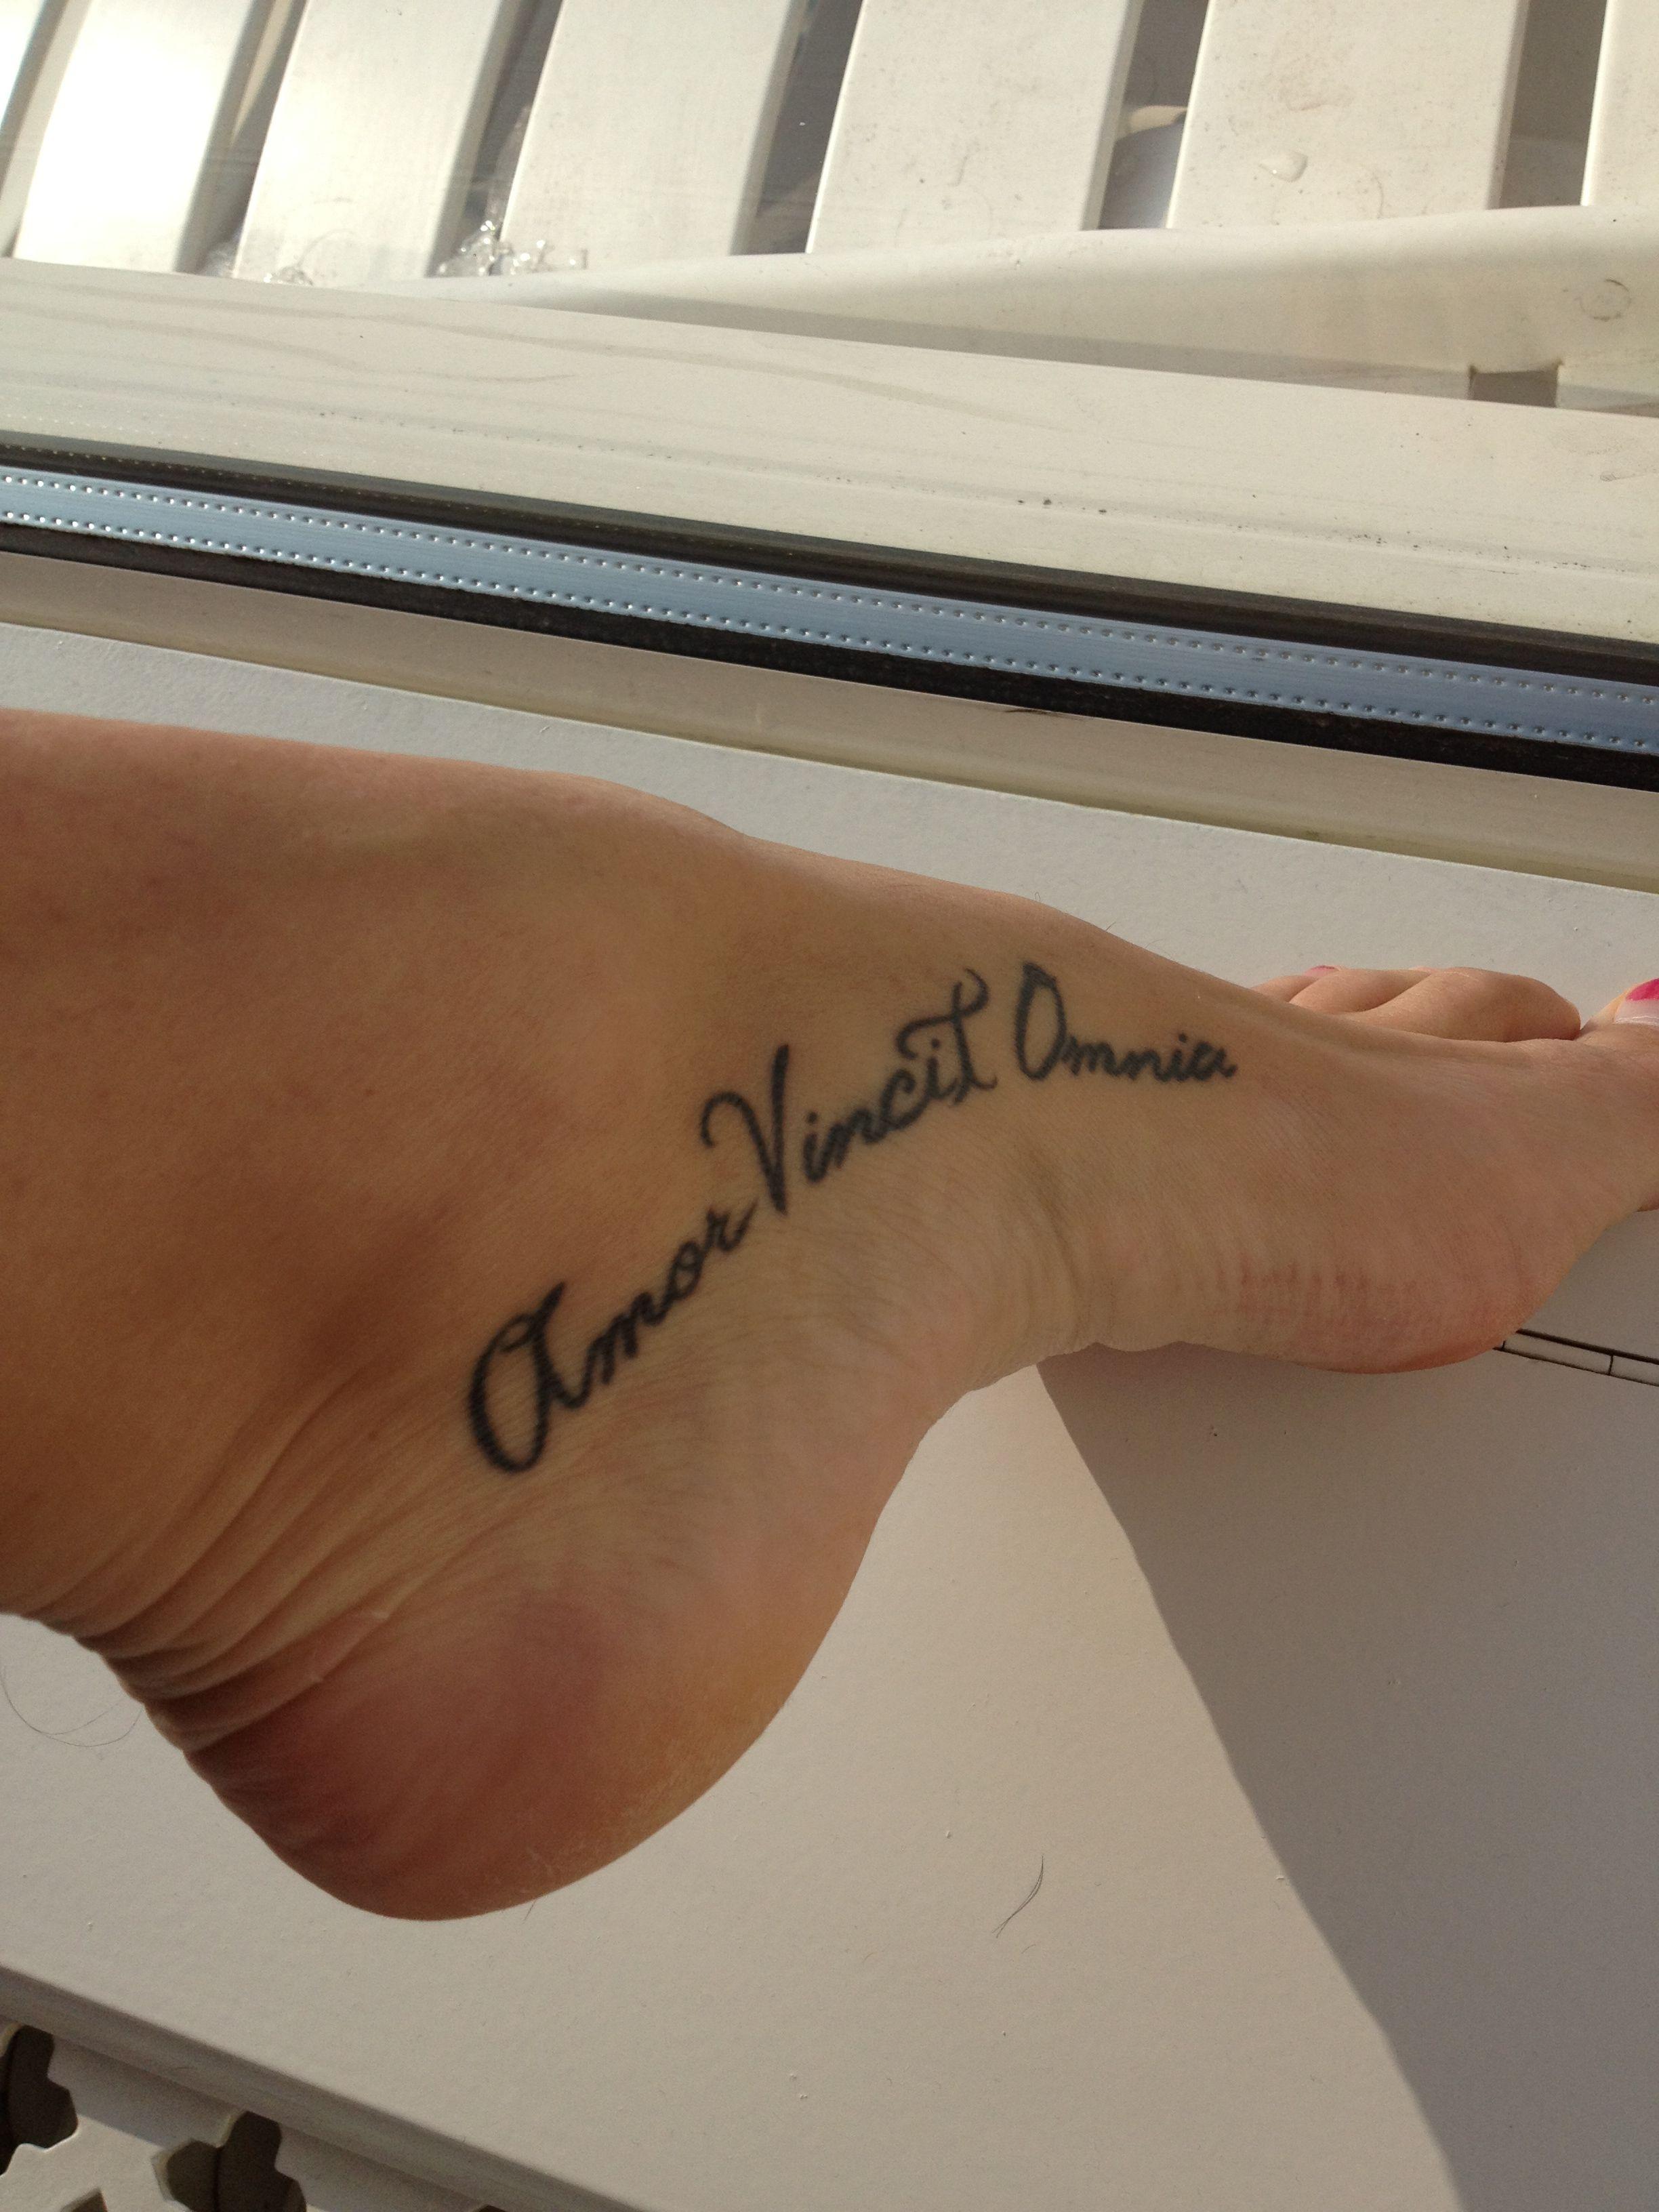 Tattoo Amor Vincit Omnia Inspirational Tattoos Tattoos Feet